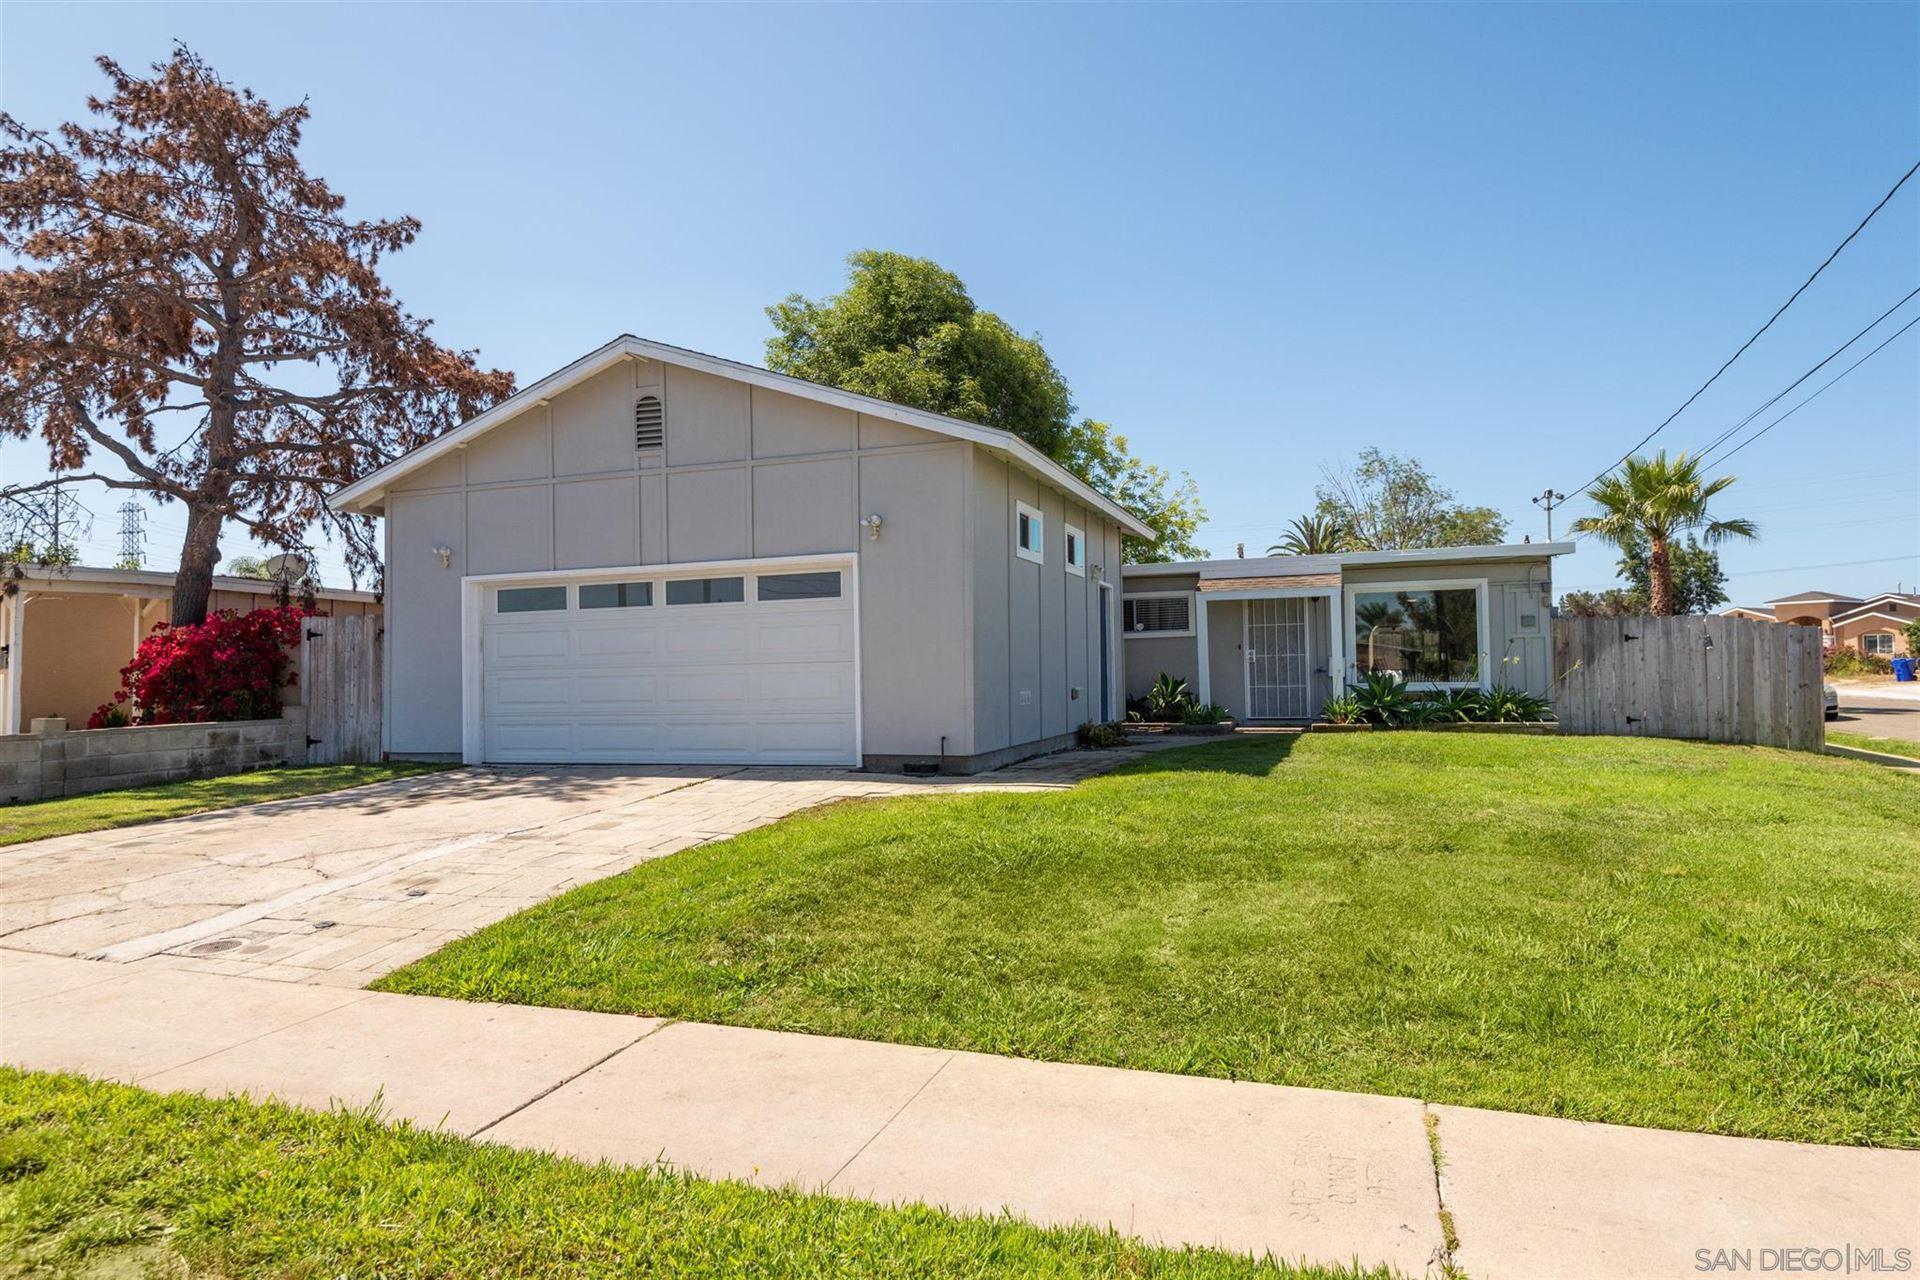 Photo of 4831 Conrad Ave, San Diego, CA 92117 (MLS # 210016237)